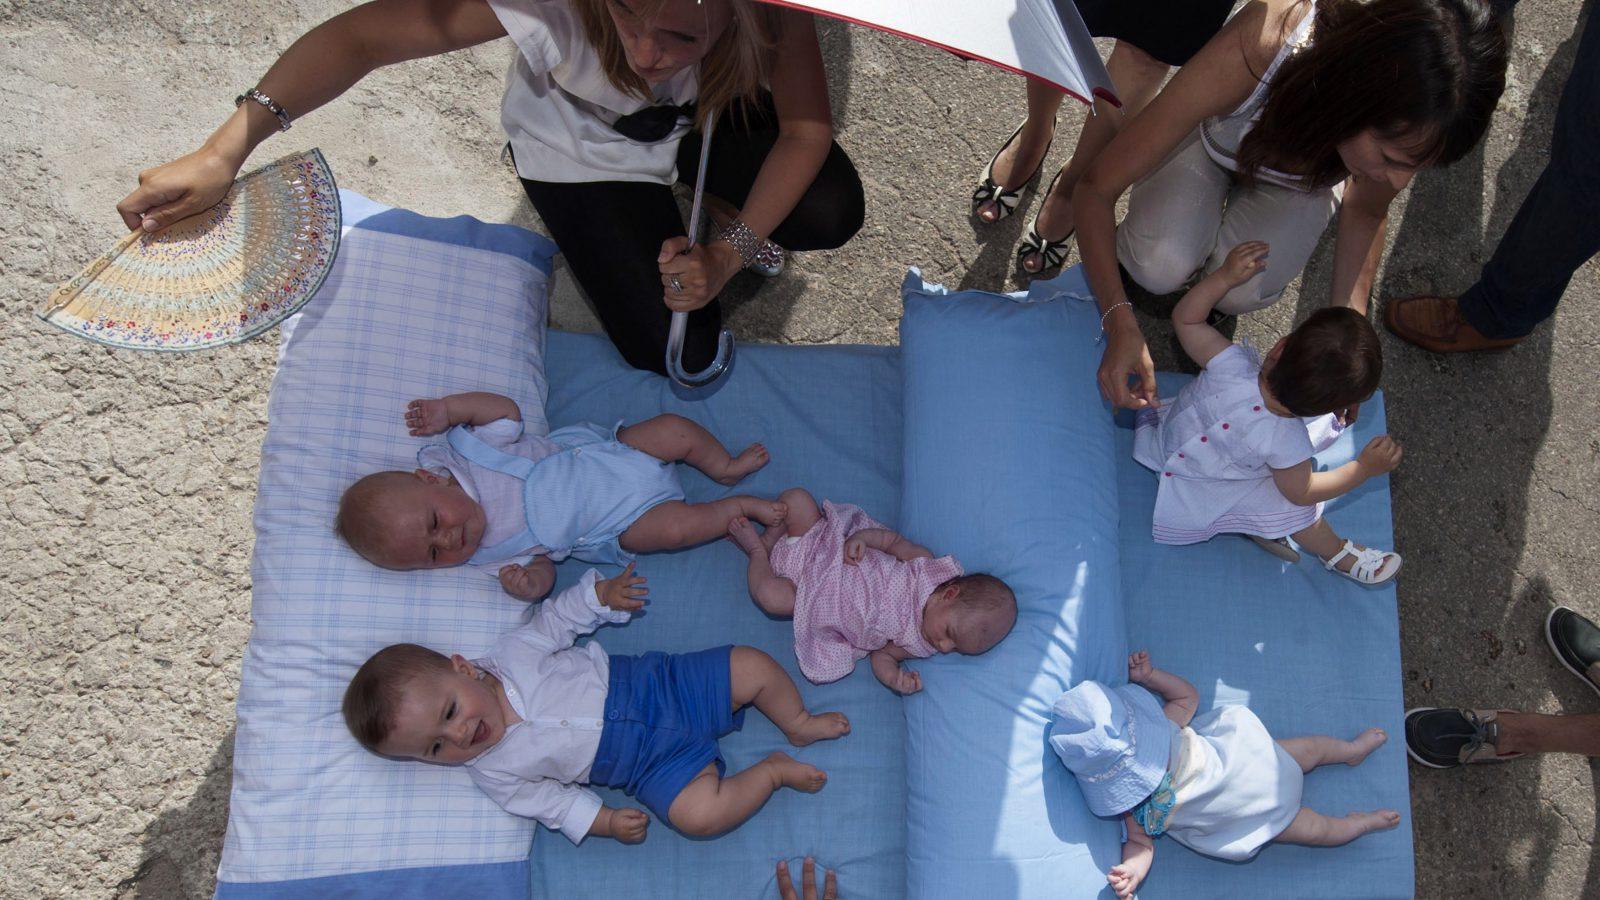 Babies on a mattress in Spain.